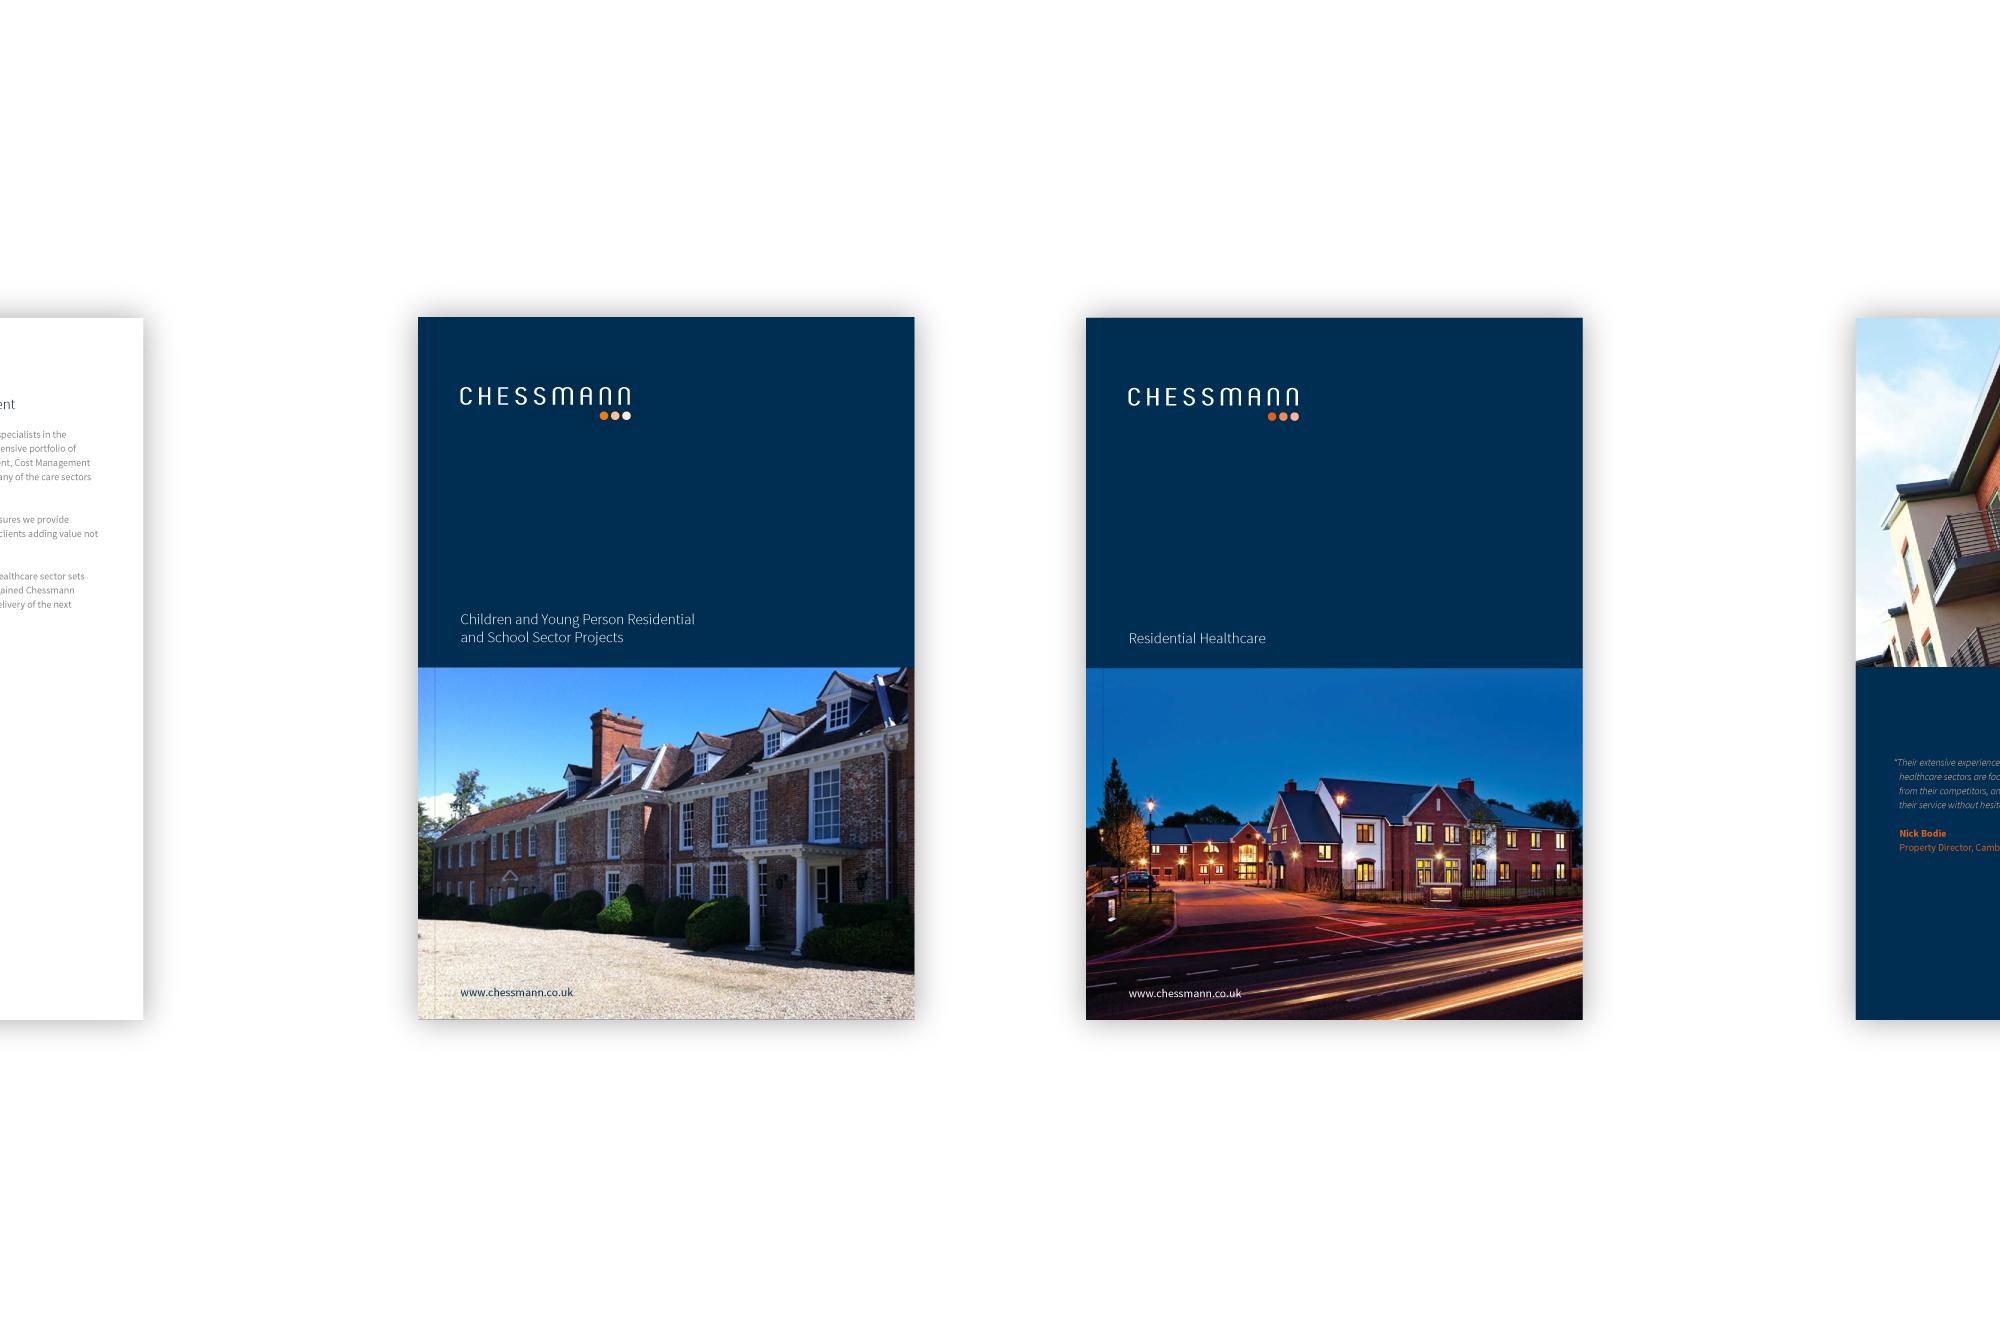 Chessmann brochure design